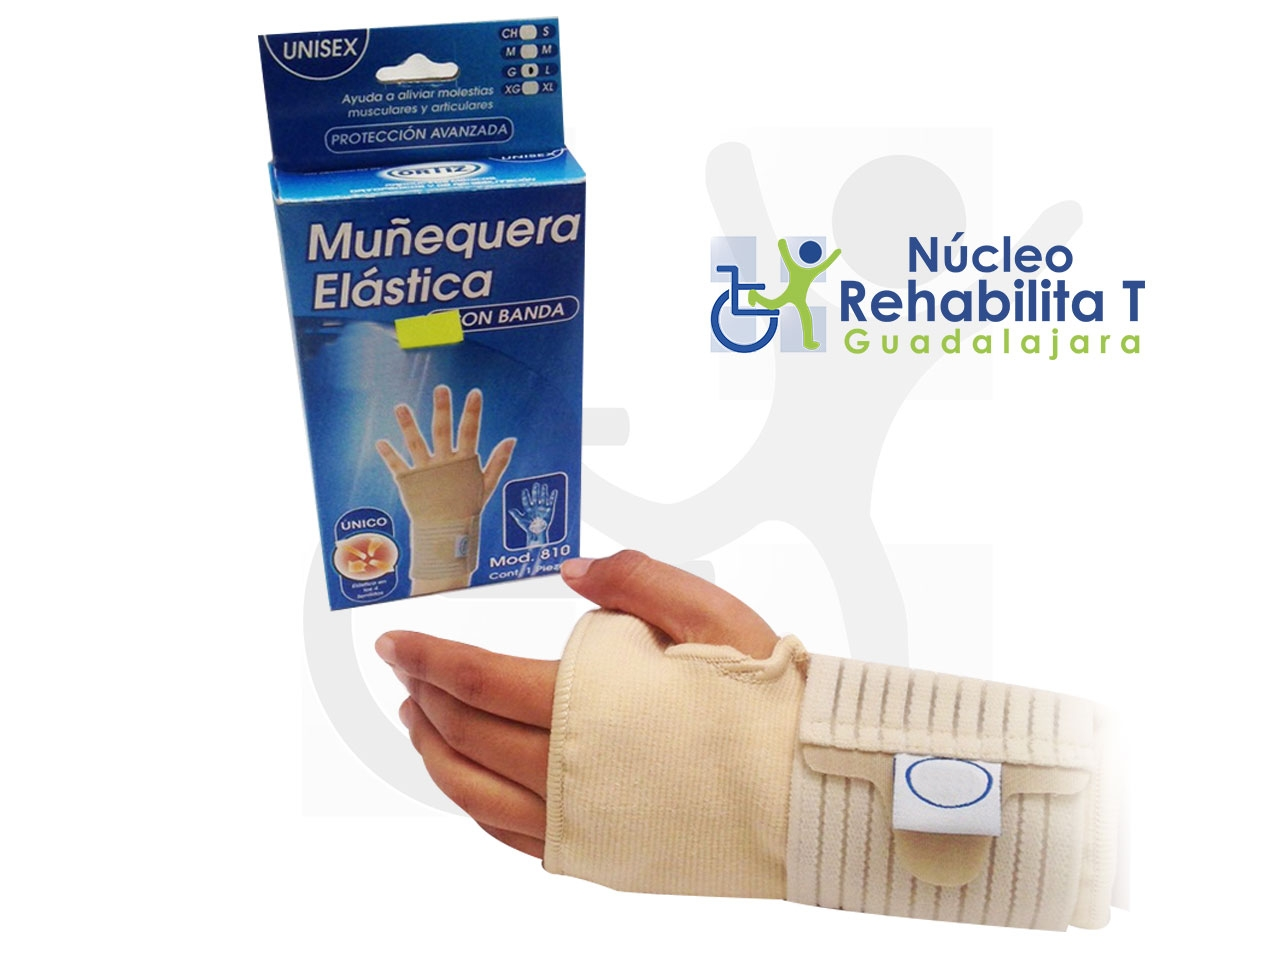 Muñequera Elástica